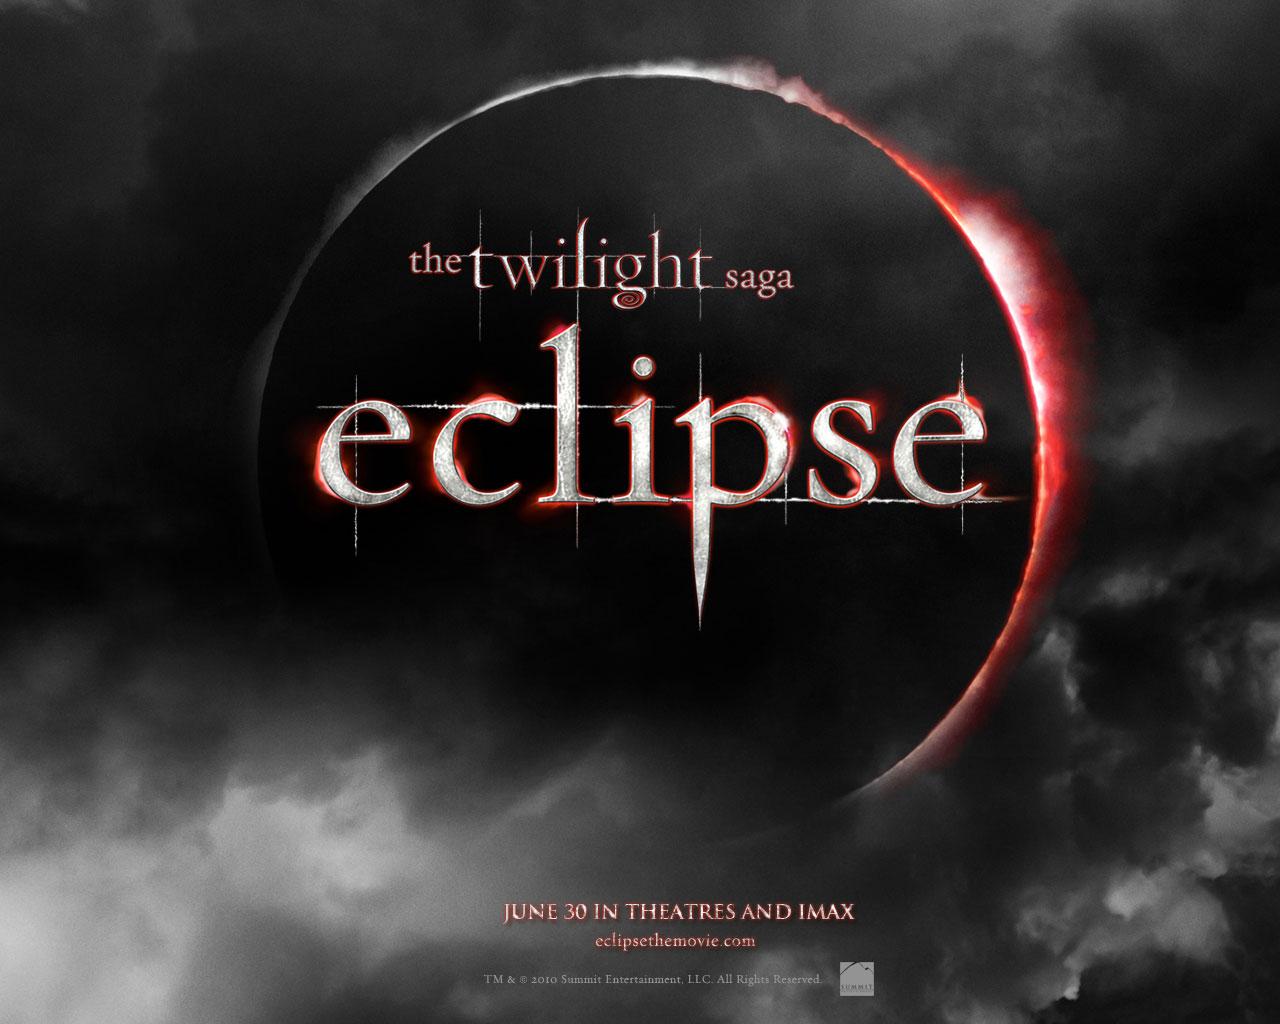 http://4.bp.blogspot.com/_-EN6_RPvgck/TDNat2F_IcI/AAAAAAAAD2M/AKsv1vuY1-0/s1600/twilighteclipse_5_1280.jpg